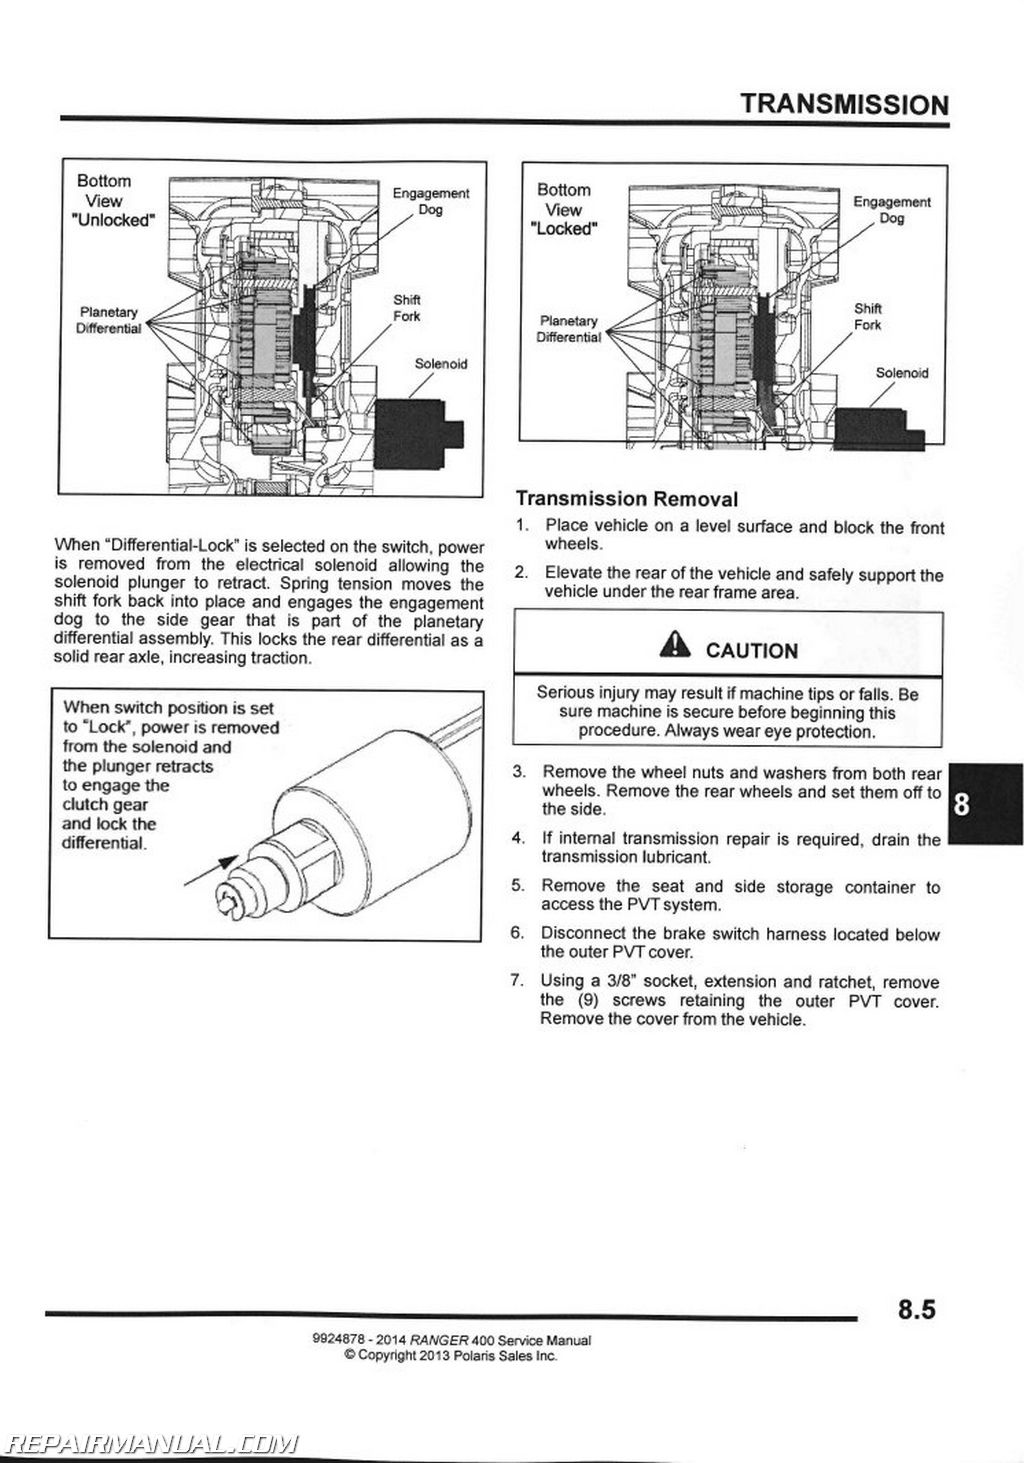 Polaris Ranger 400 Engine Diagram Manual Guide Wiring 2014 Side By Service Rh Repairmanual Com 2001 500